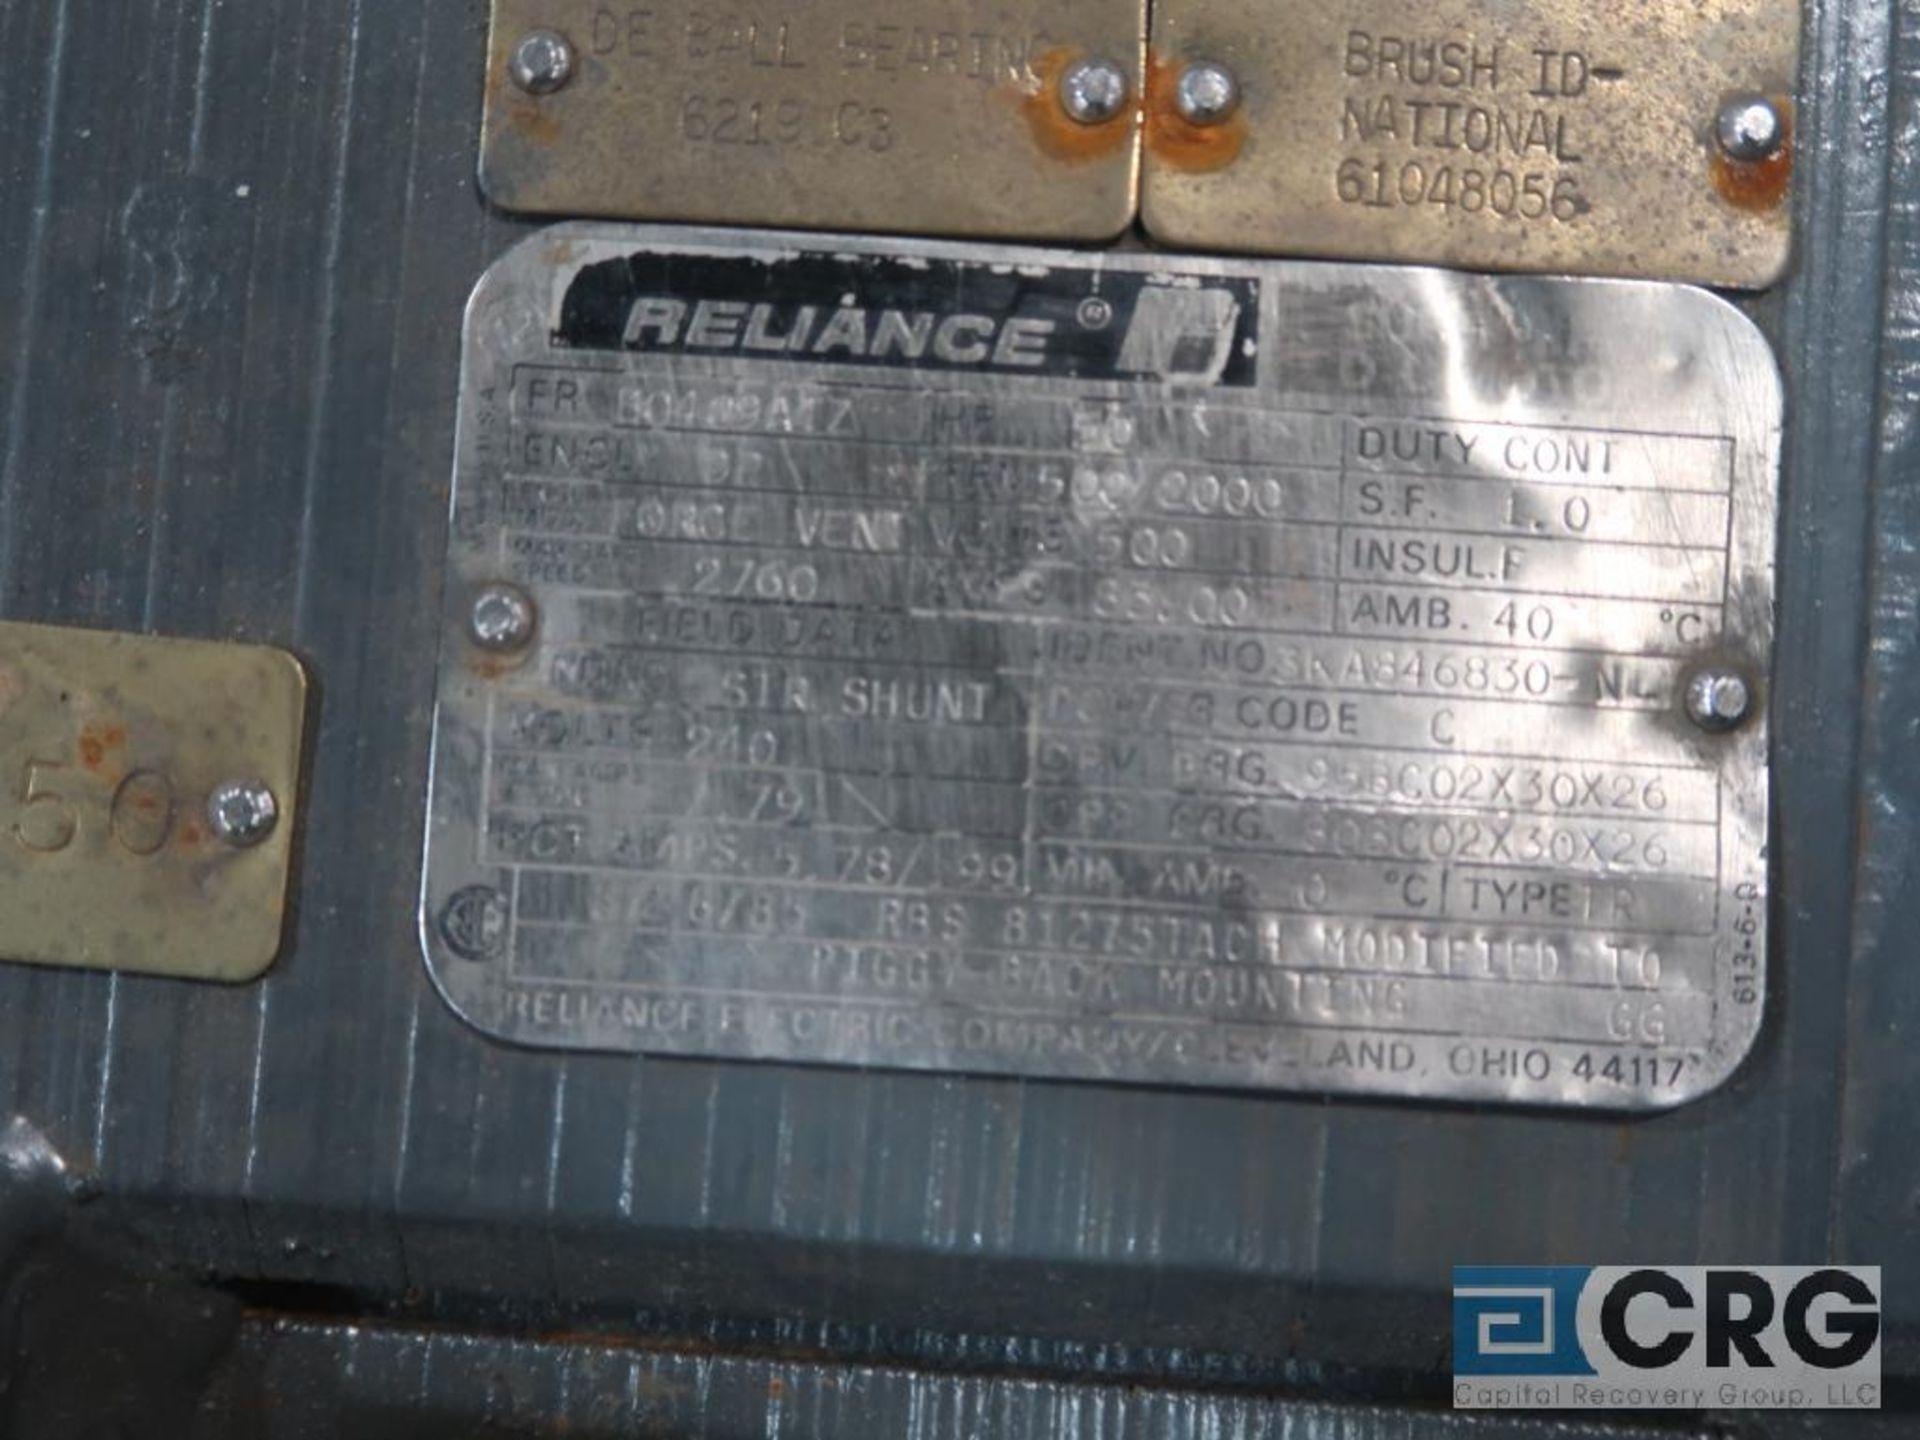 Reliance D-C motor, 50 HP, 500/2,000 RPMs, 500 volt, 3 ph., B0409ATZ frame (Finish Building) - Image 2 of 2